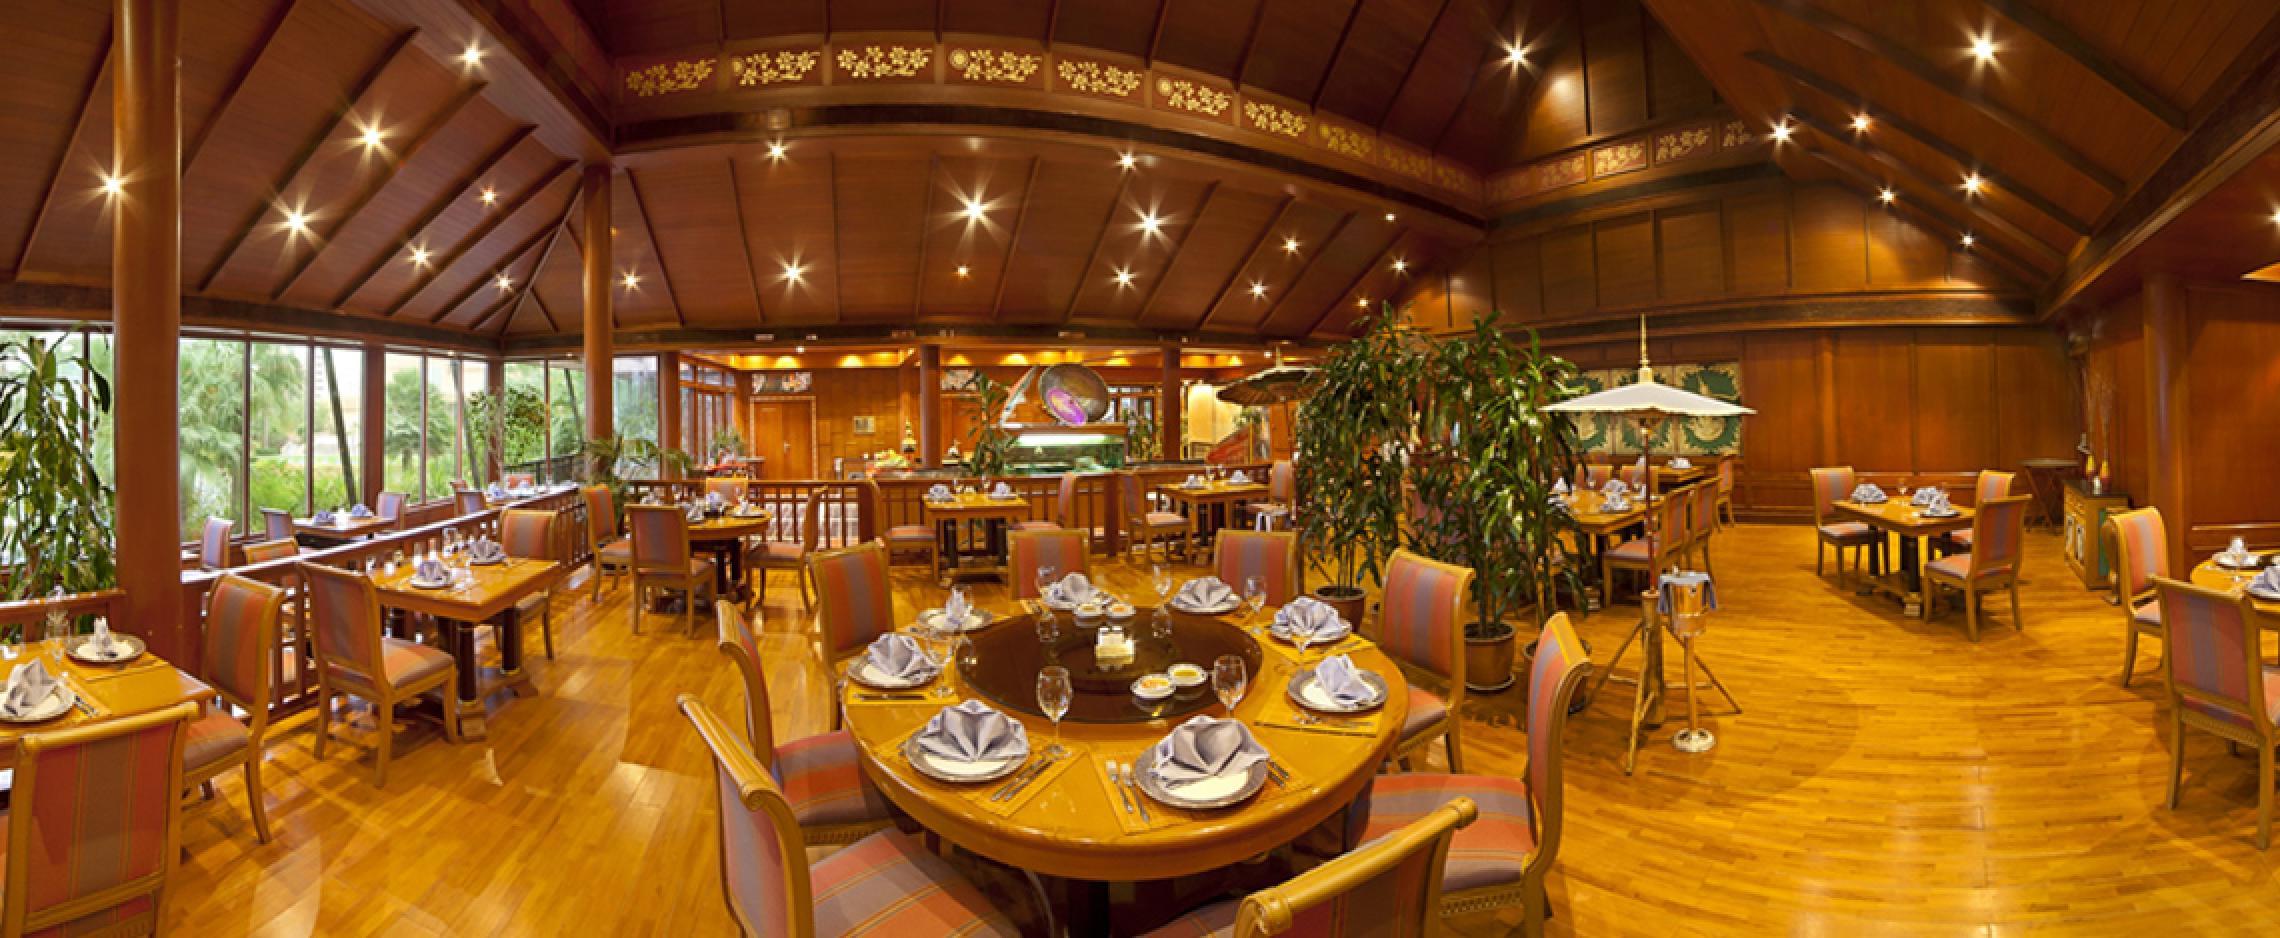 Dining table buffet decor